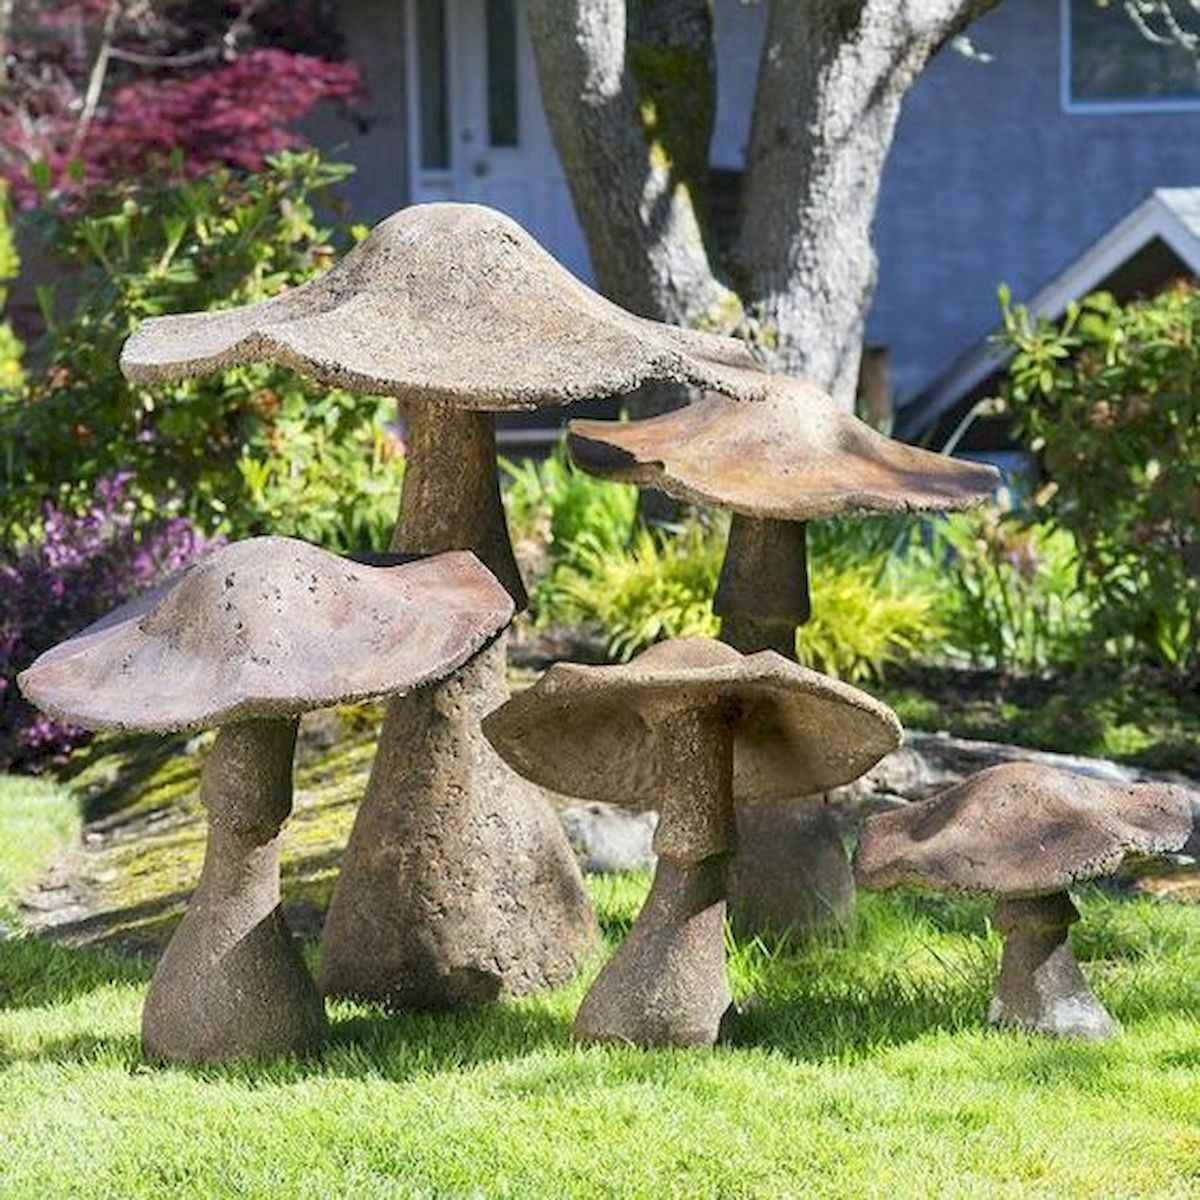 55 Creative Garden Art Mushrooms Design Ideas For Summer (46)